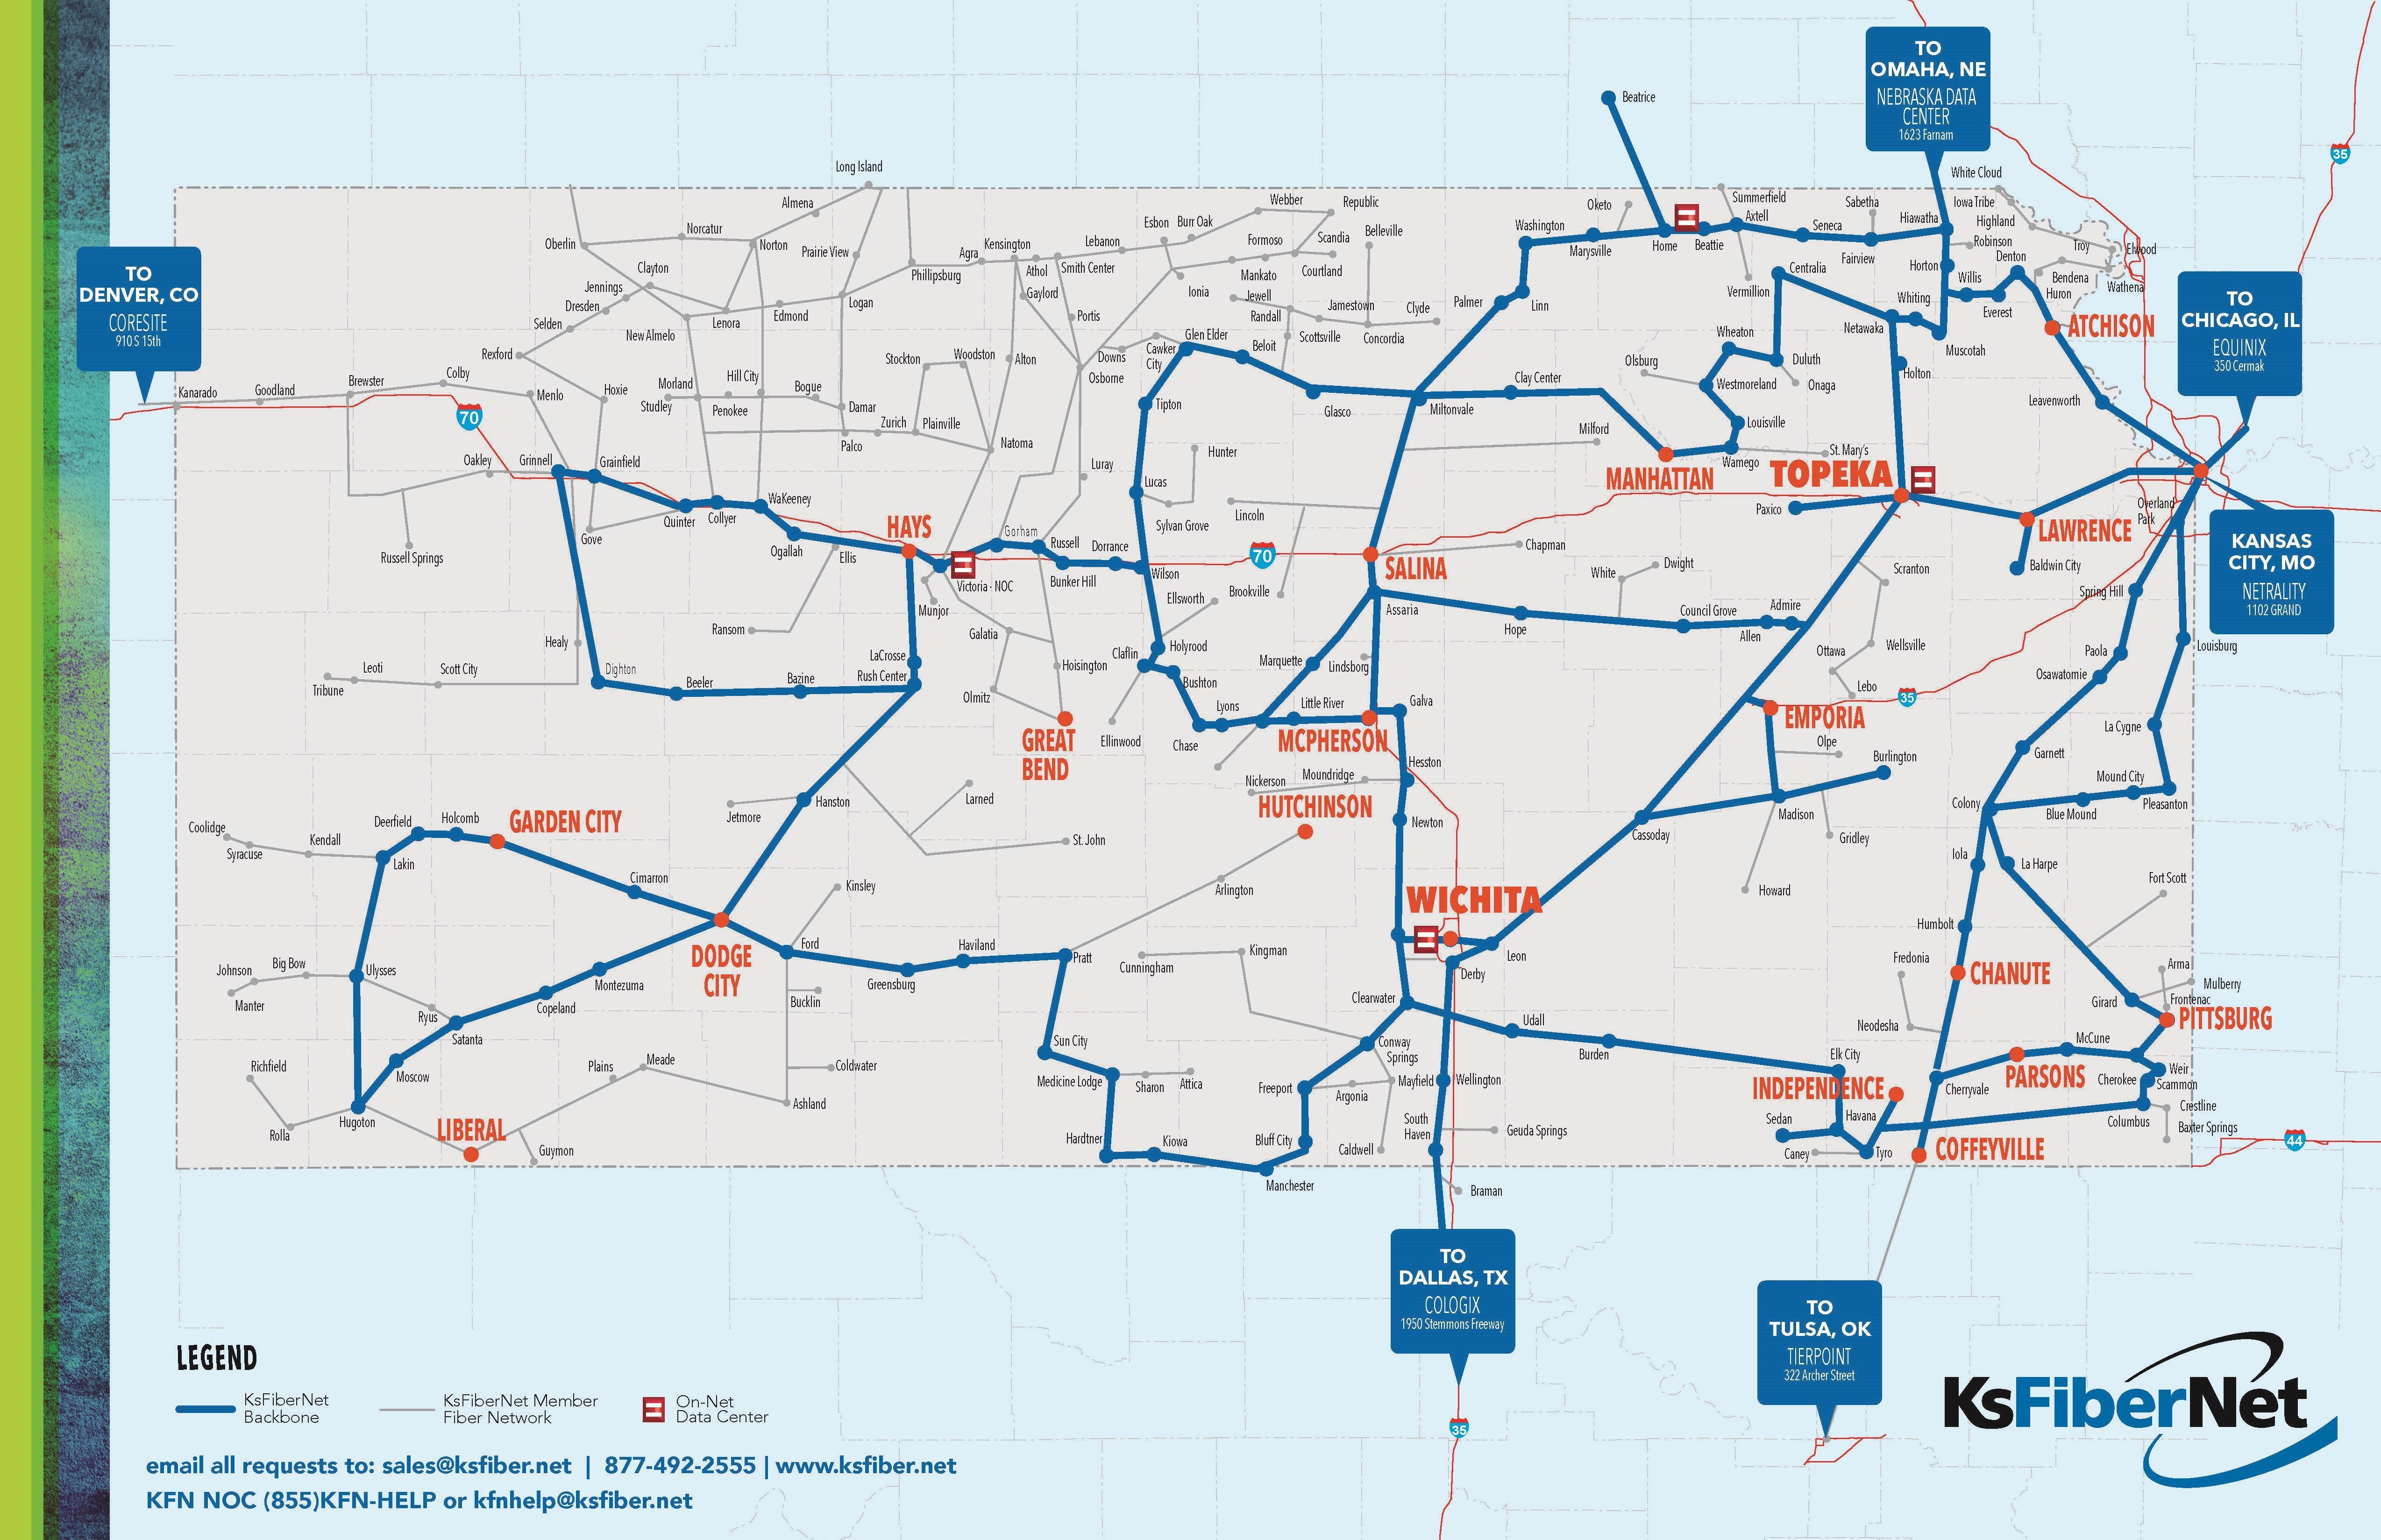 Our Fiber Network KsFiberNet - Network map page